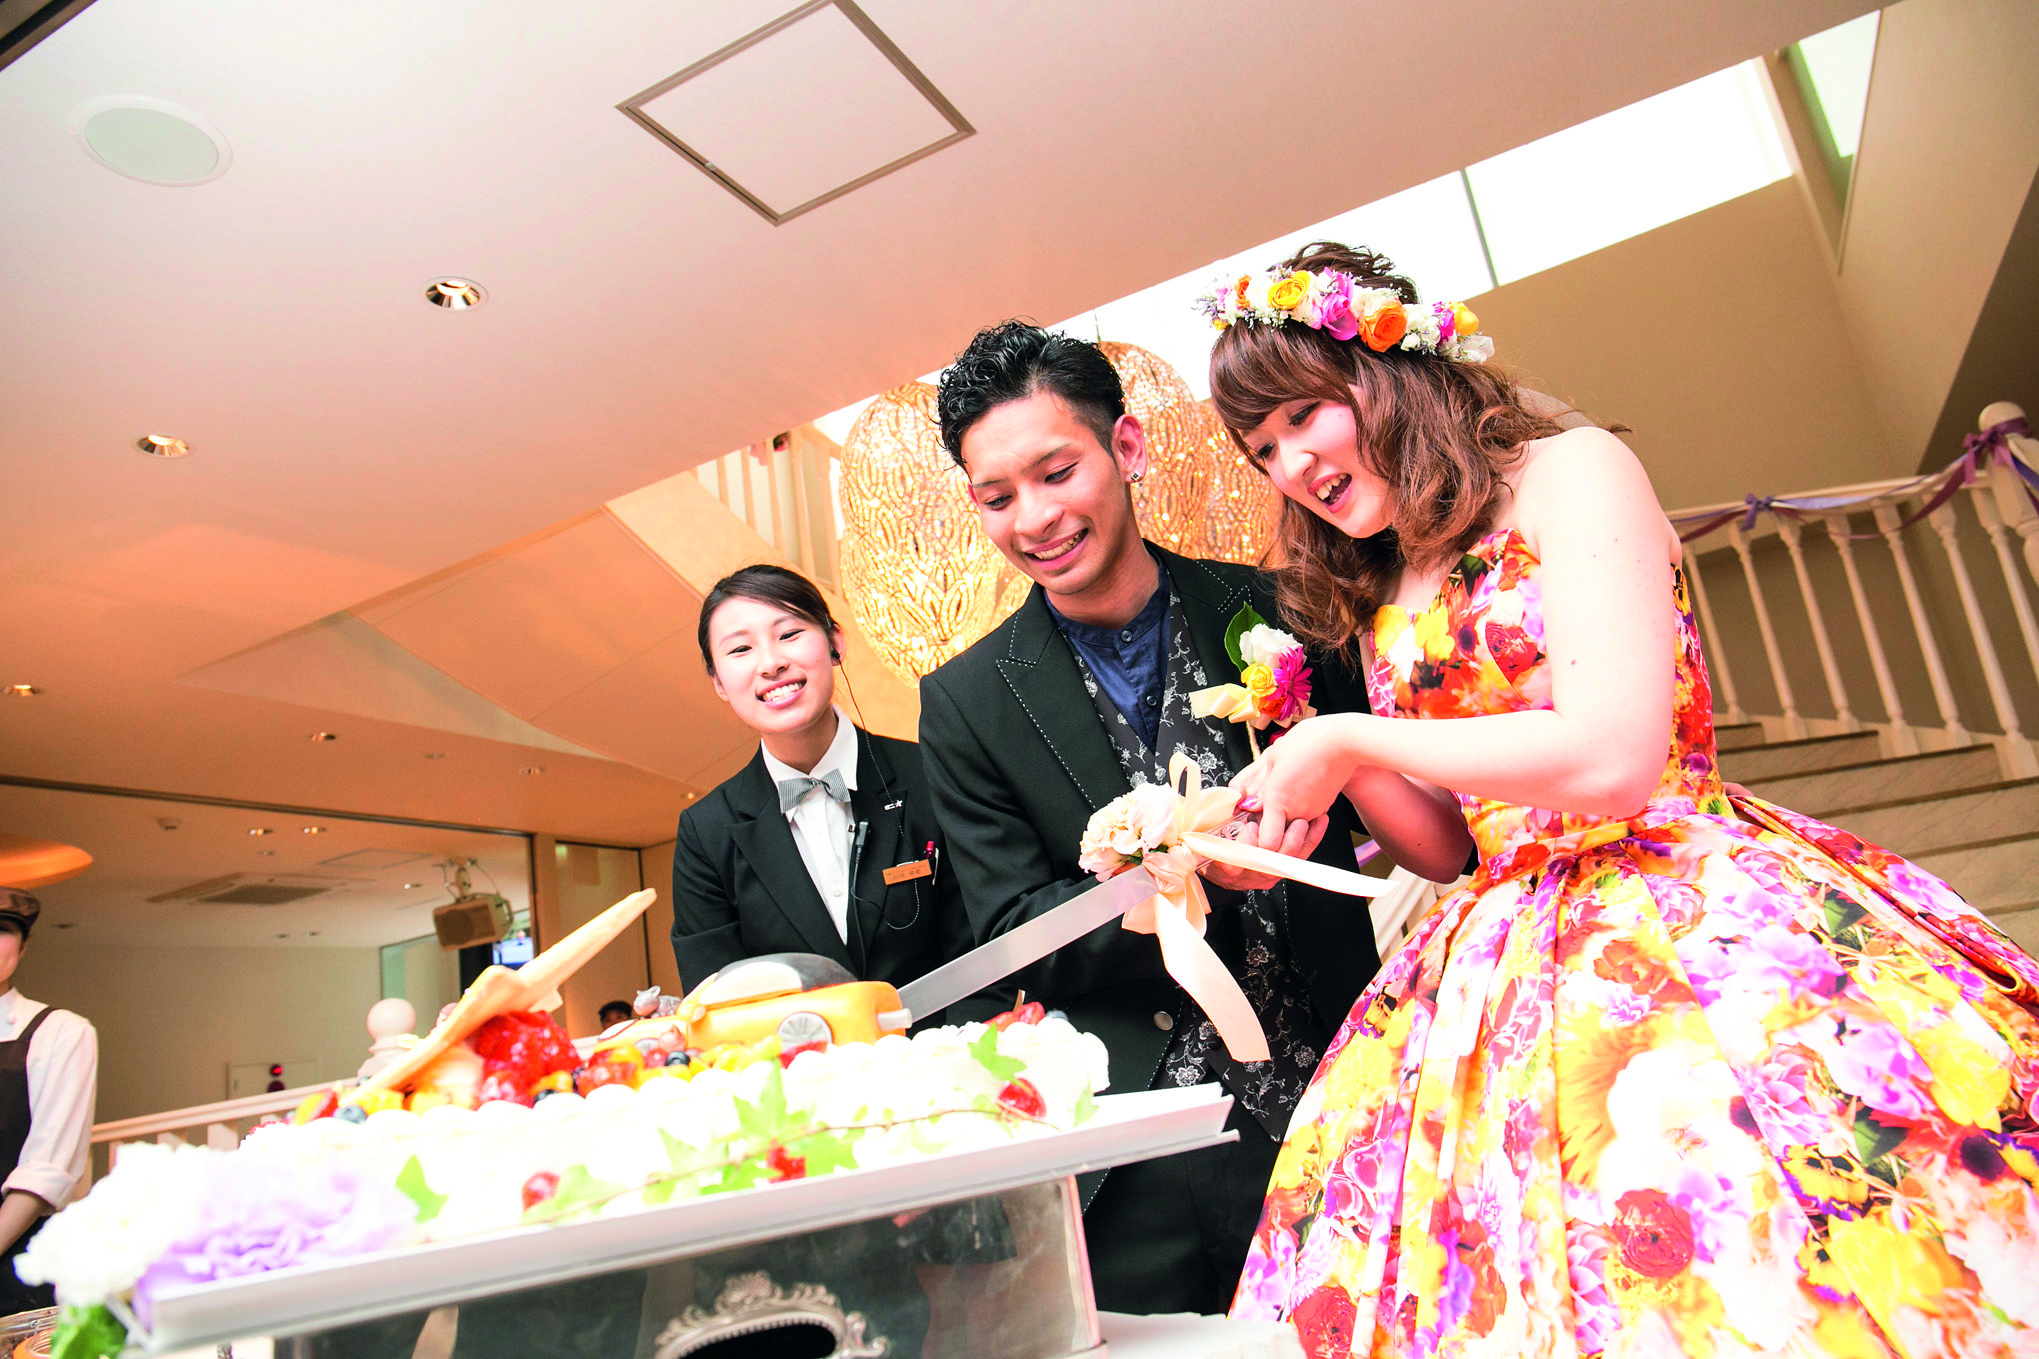 19SBH_P09_本物の結婚式当日08.jpg